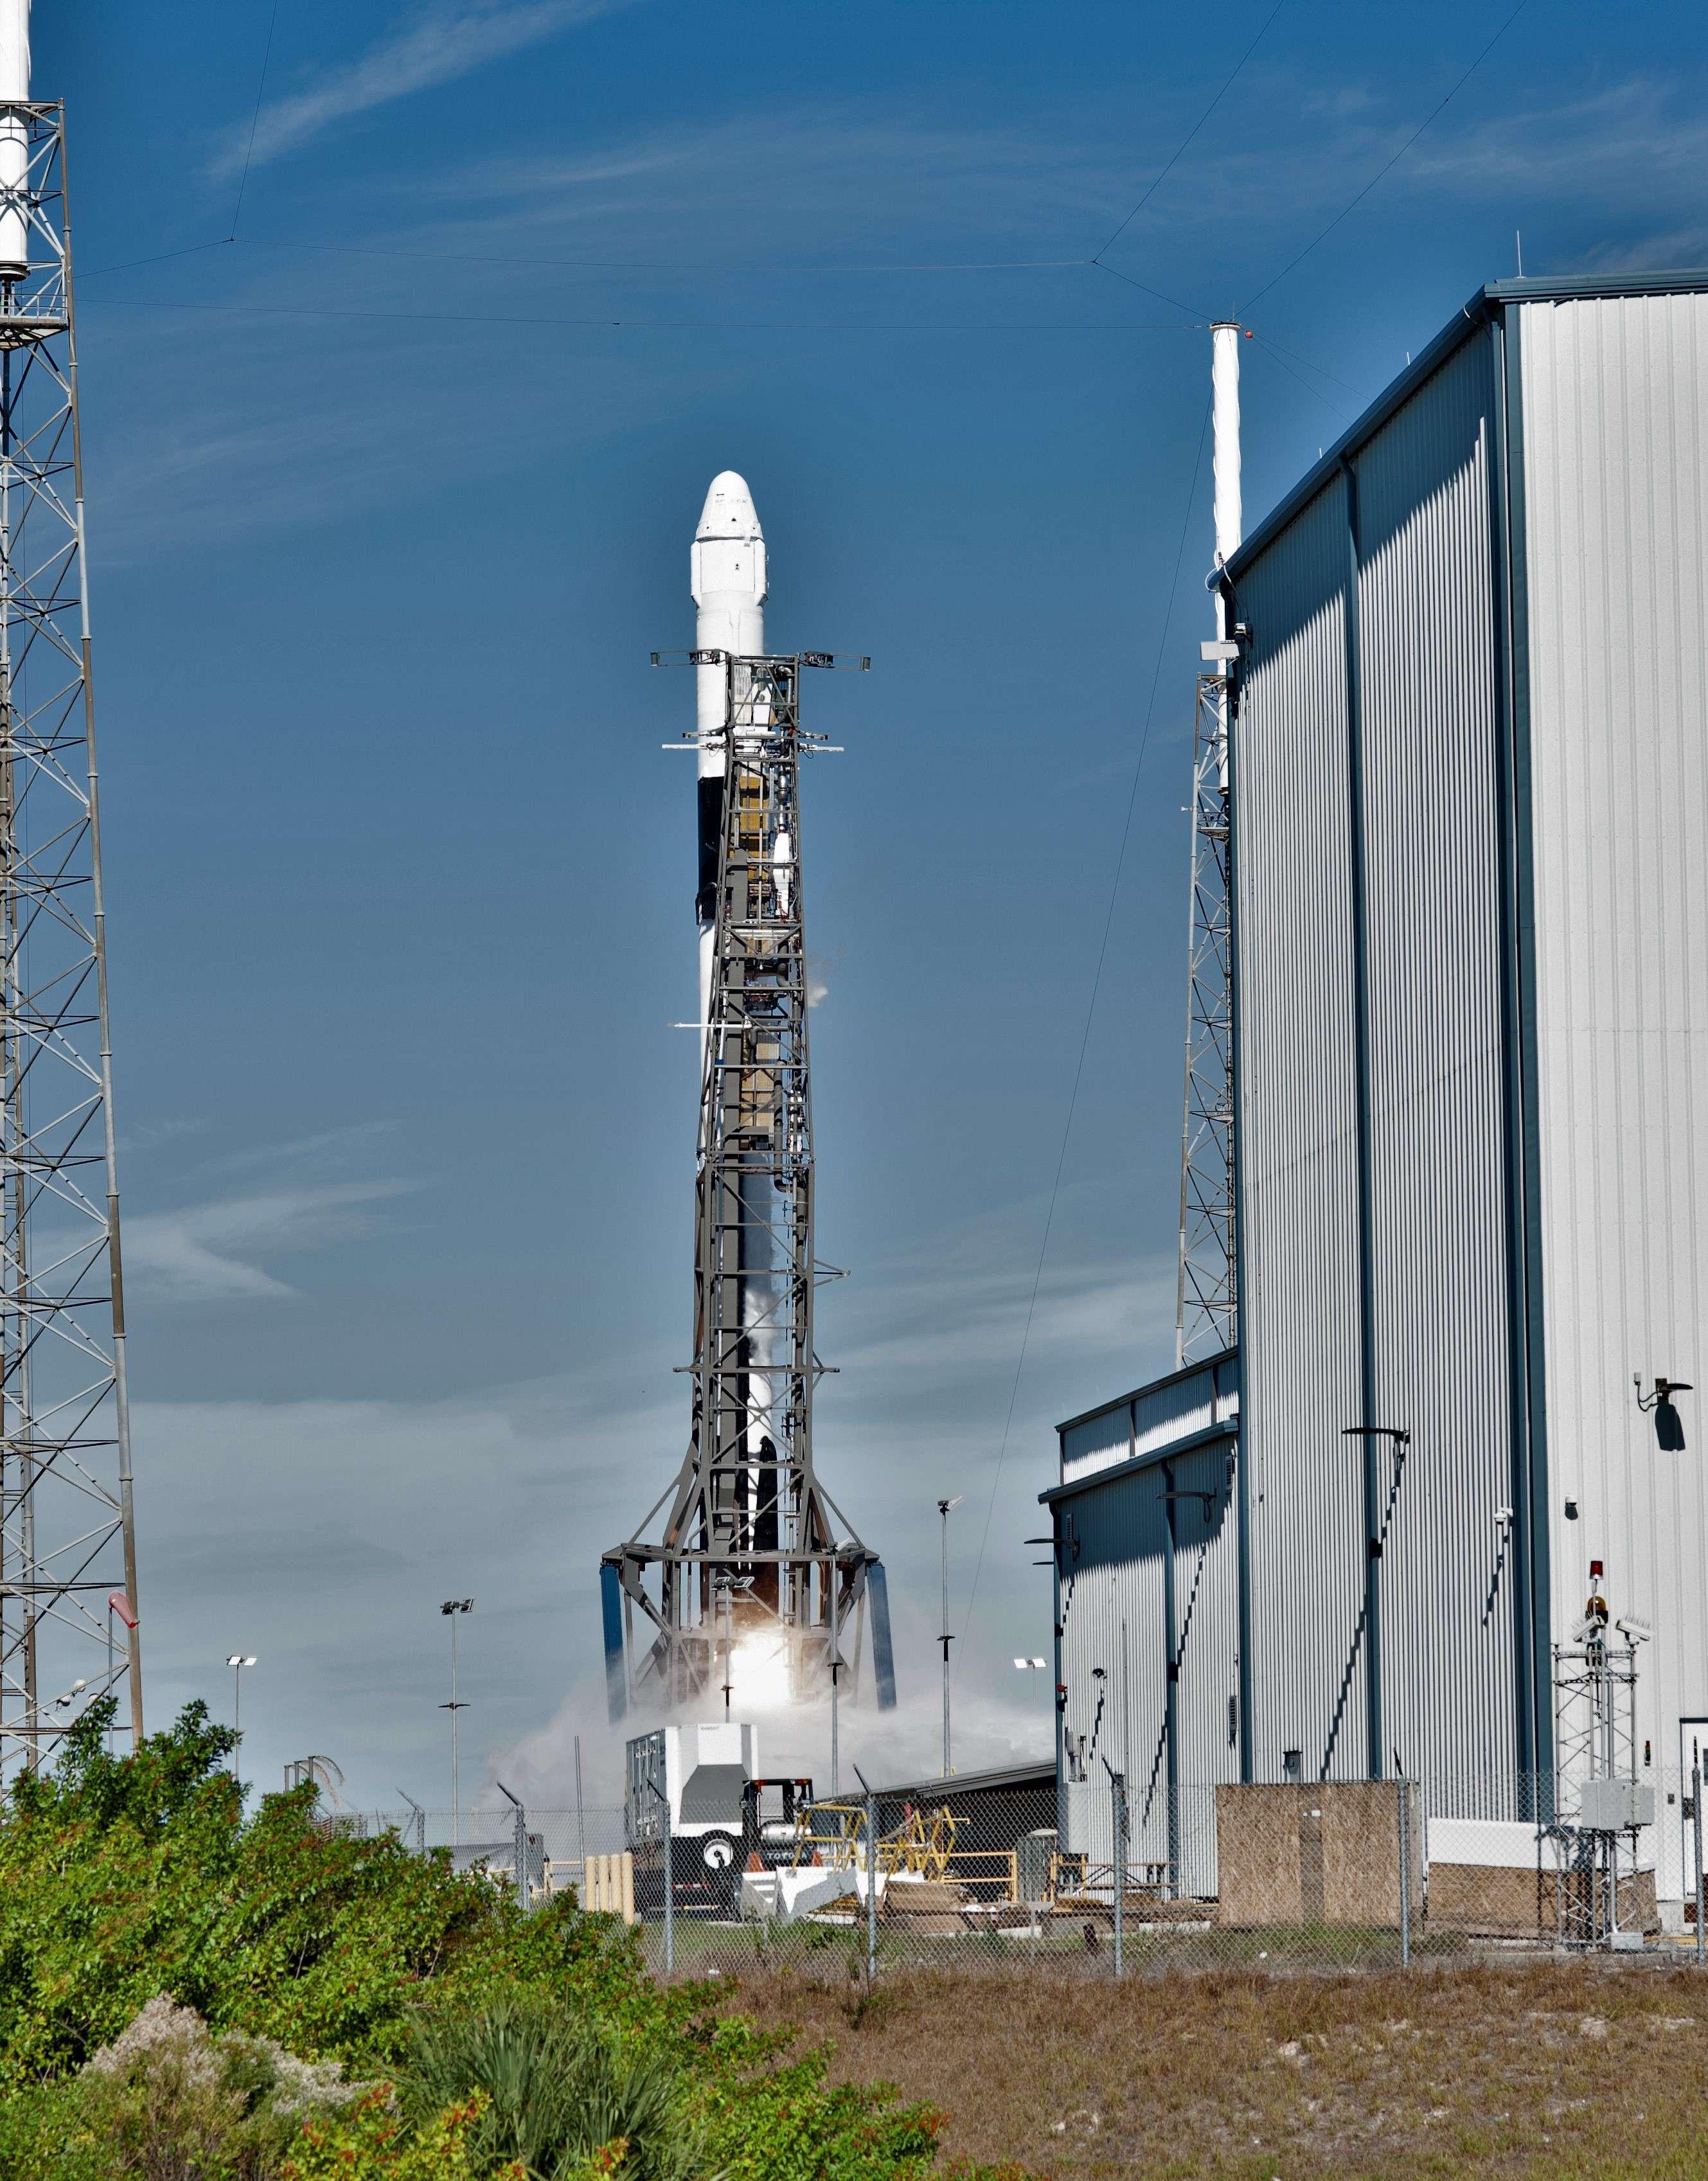 Falcon 9 B1050 Cargo Dragon CRS-16 launch (NASA) 6(c)